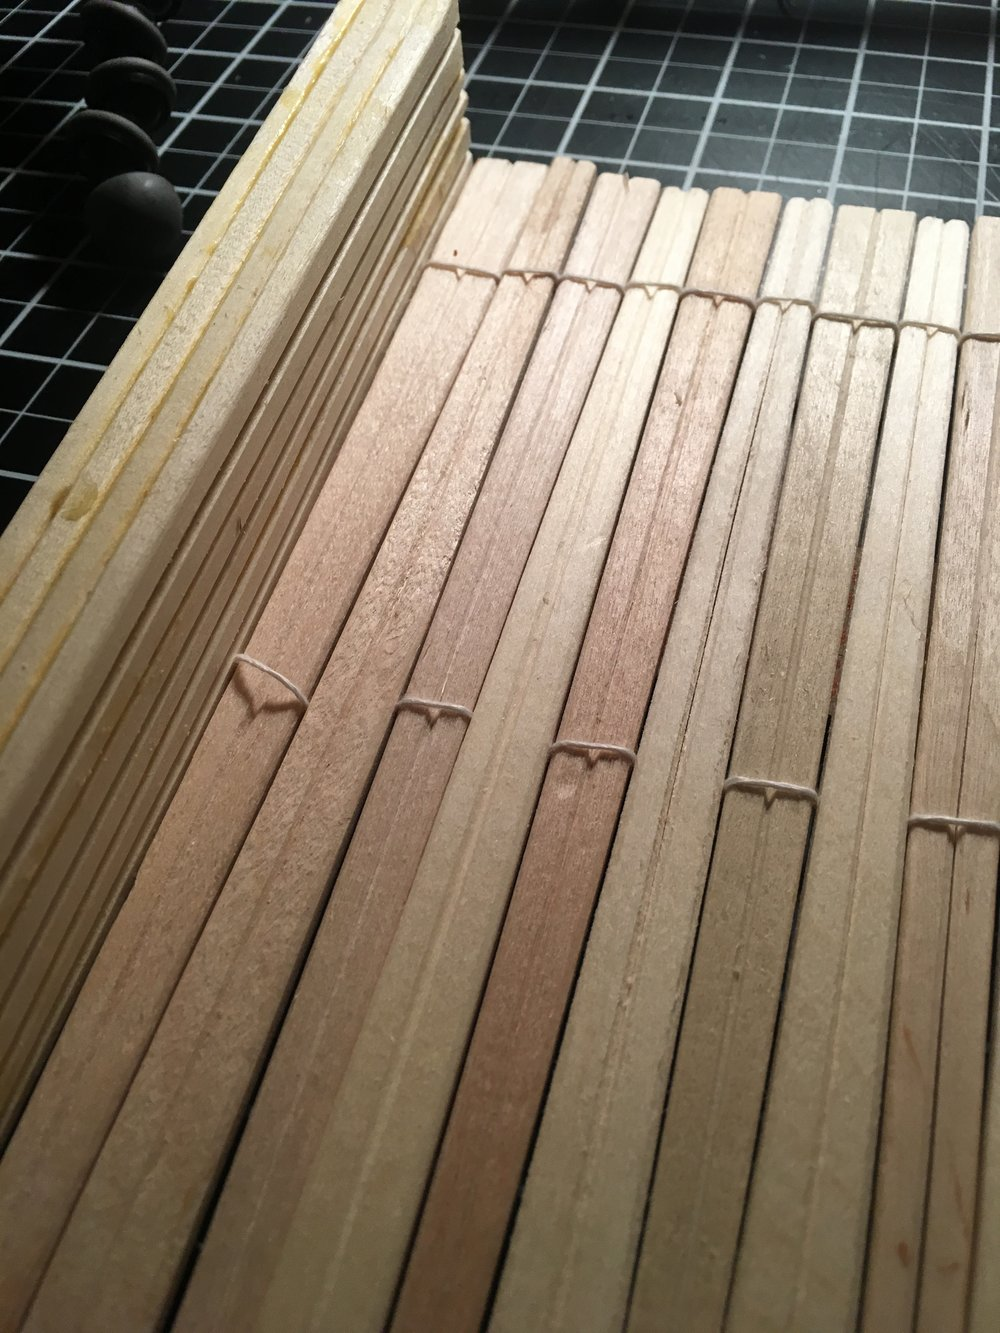 Chop Sticks construction-03.jpg